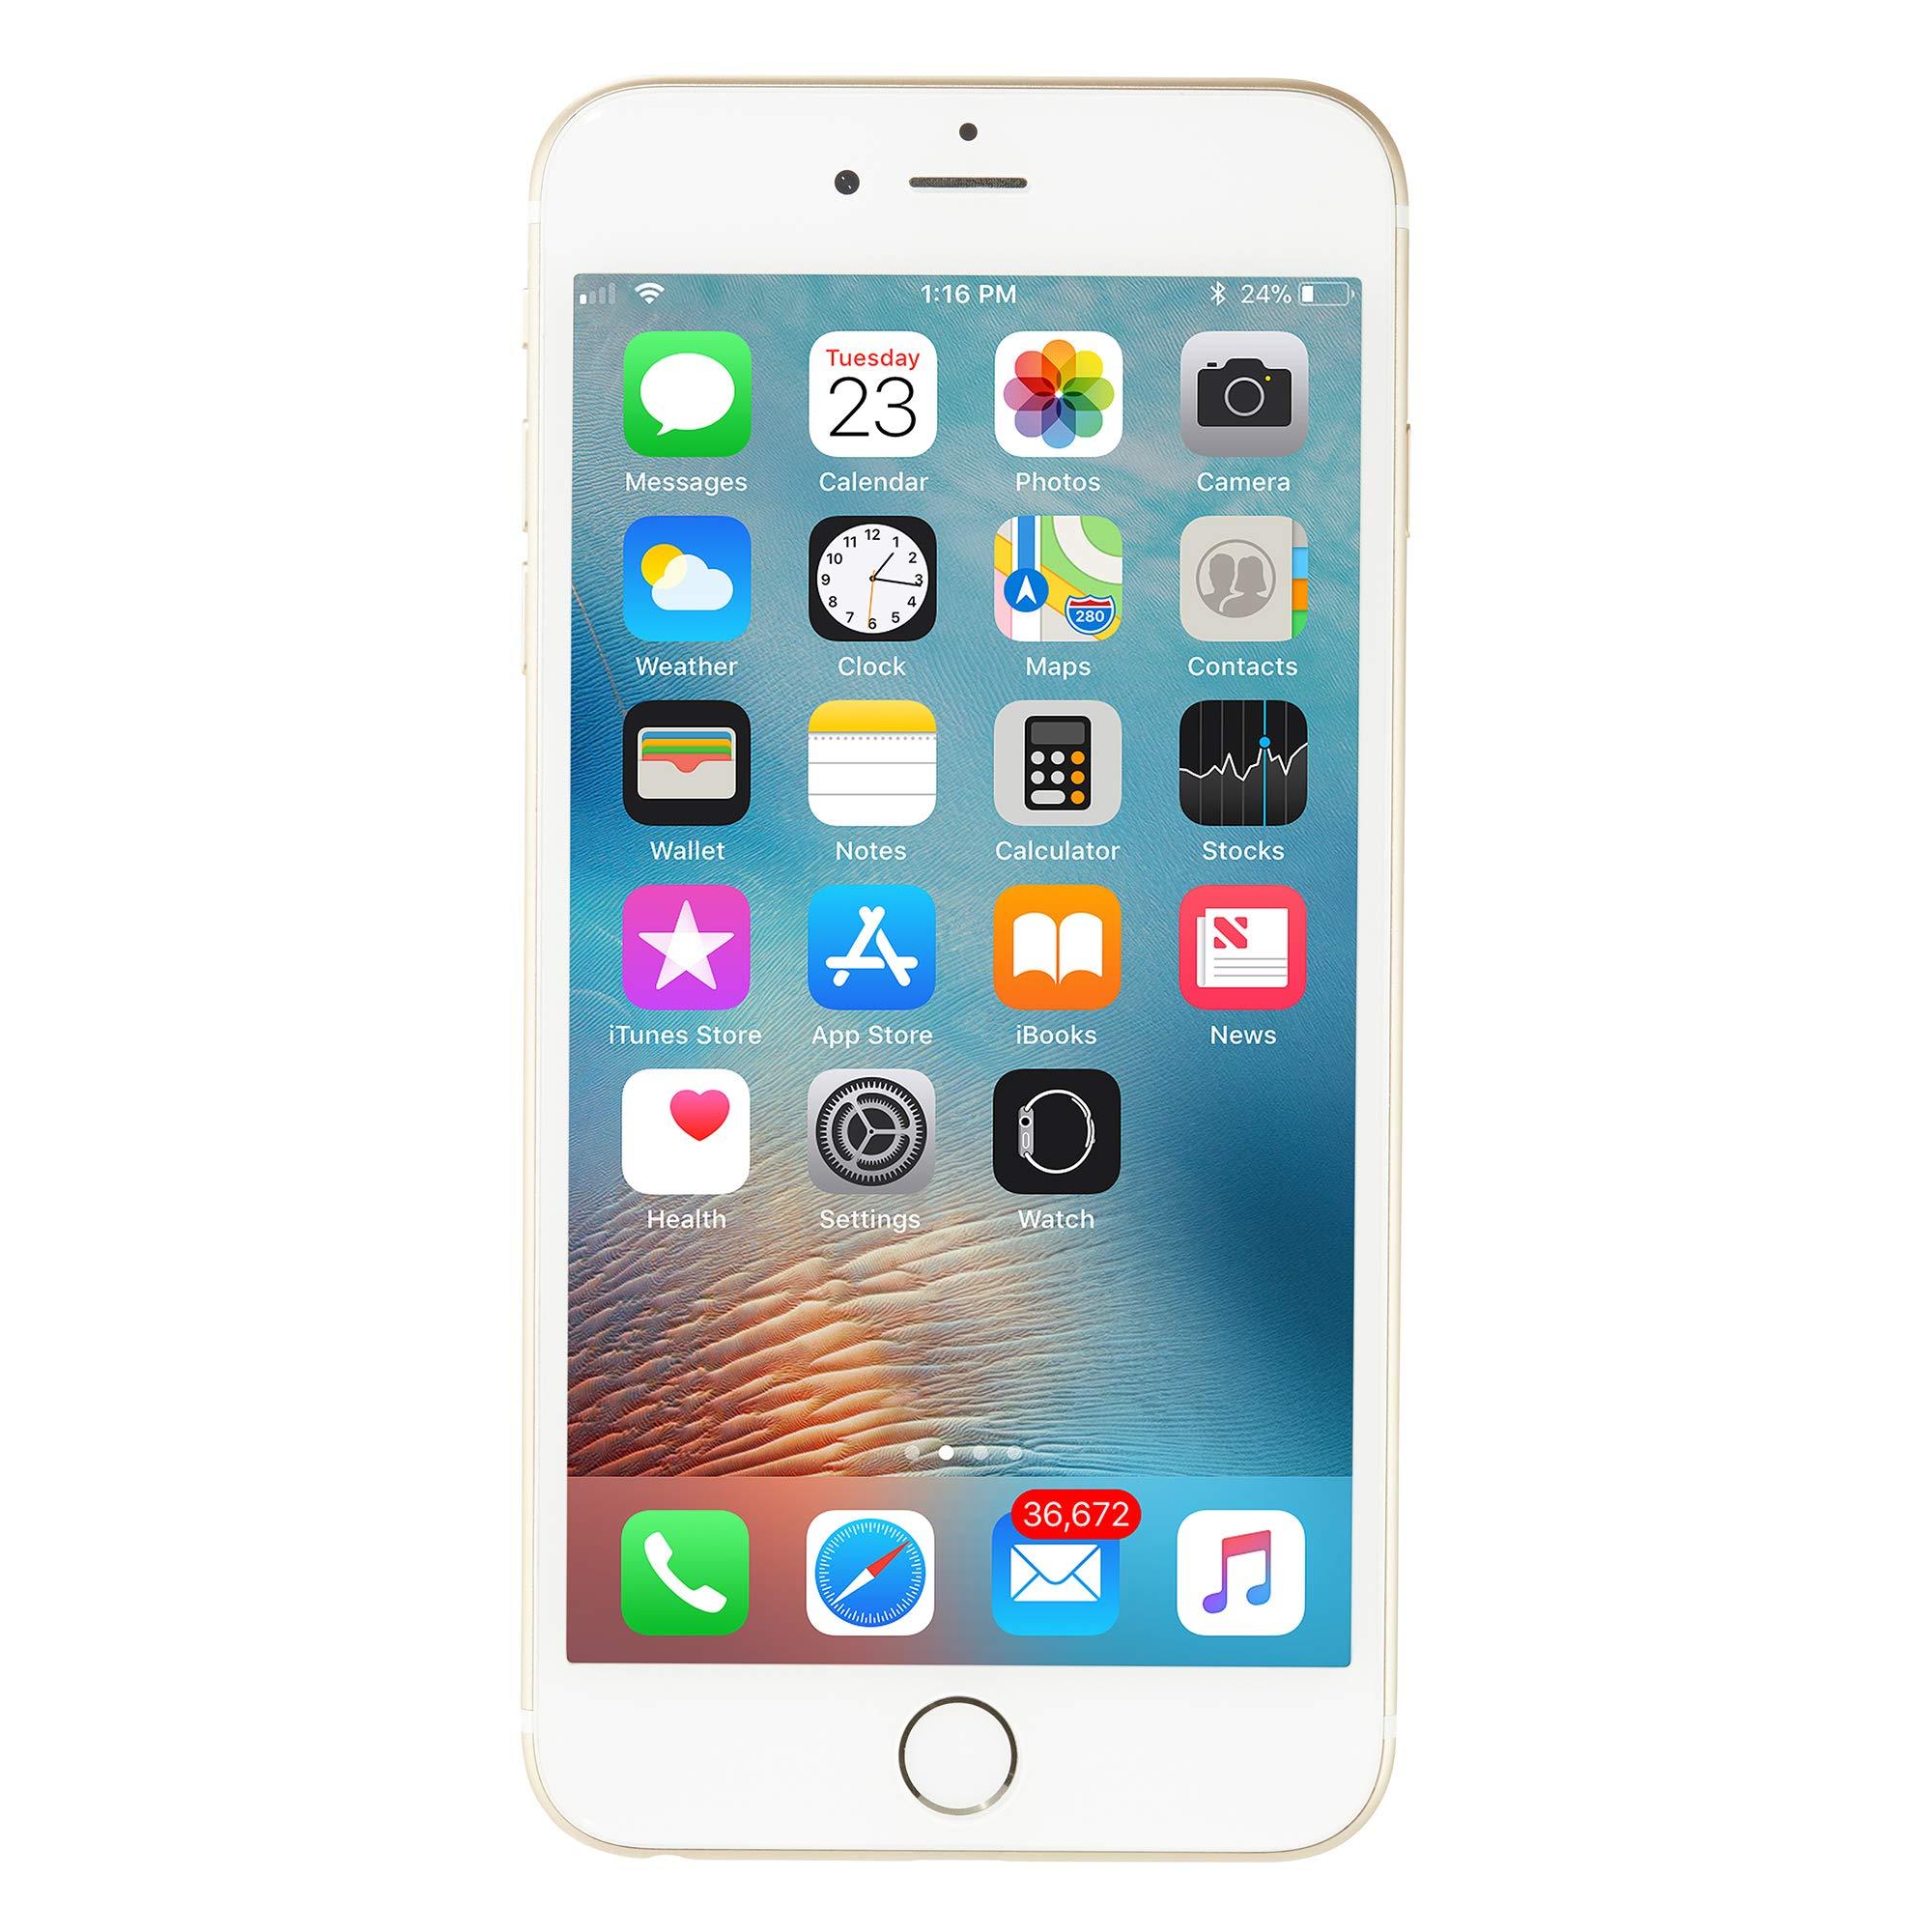 Apple iPhone 6 Plus, GSM Unlocked, 16GB - Gold (Renewed) by Apple